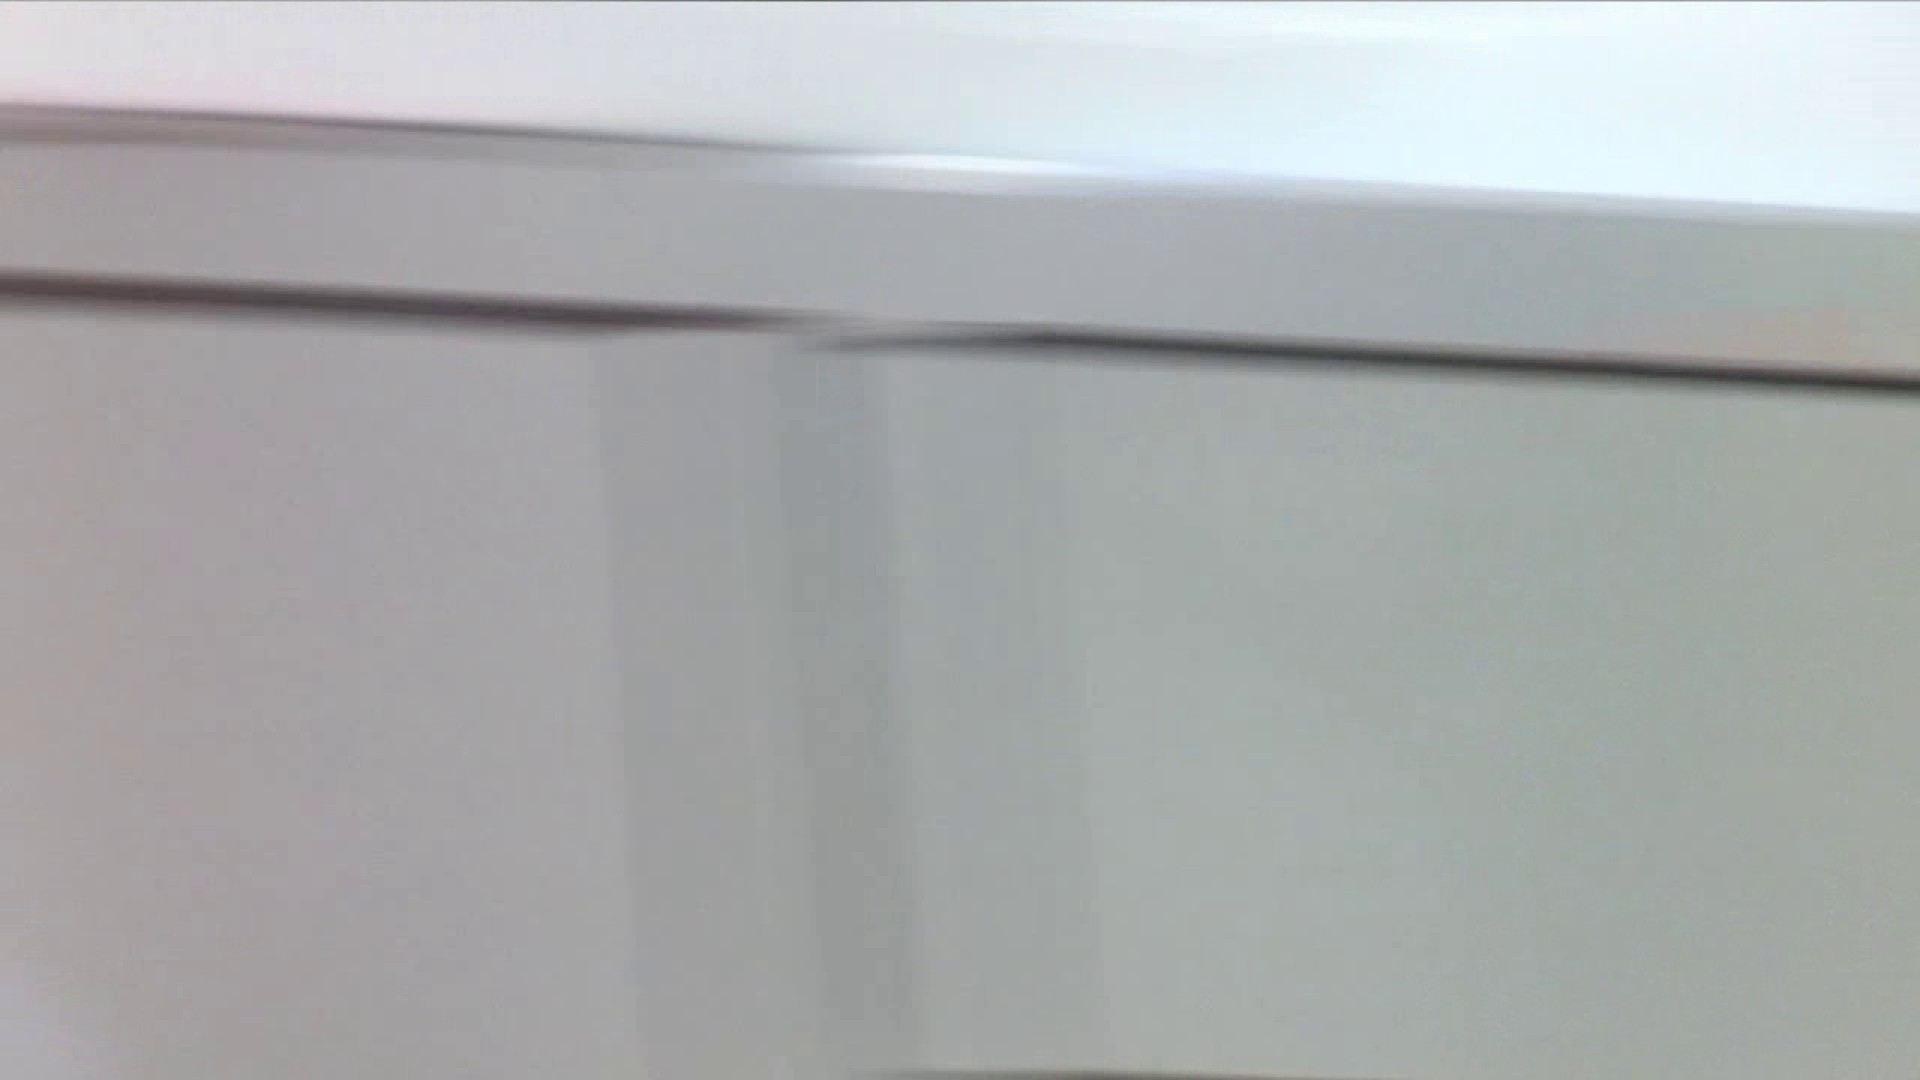 vol.34 美人アパレル胸チラ&パンチラ メガネ属性っていいよね♥ 新入生パンチラ ヌード画像 104pic 10